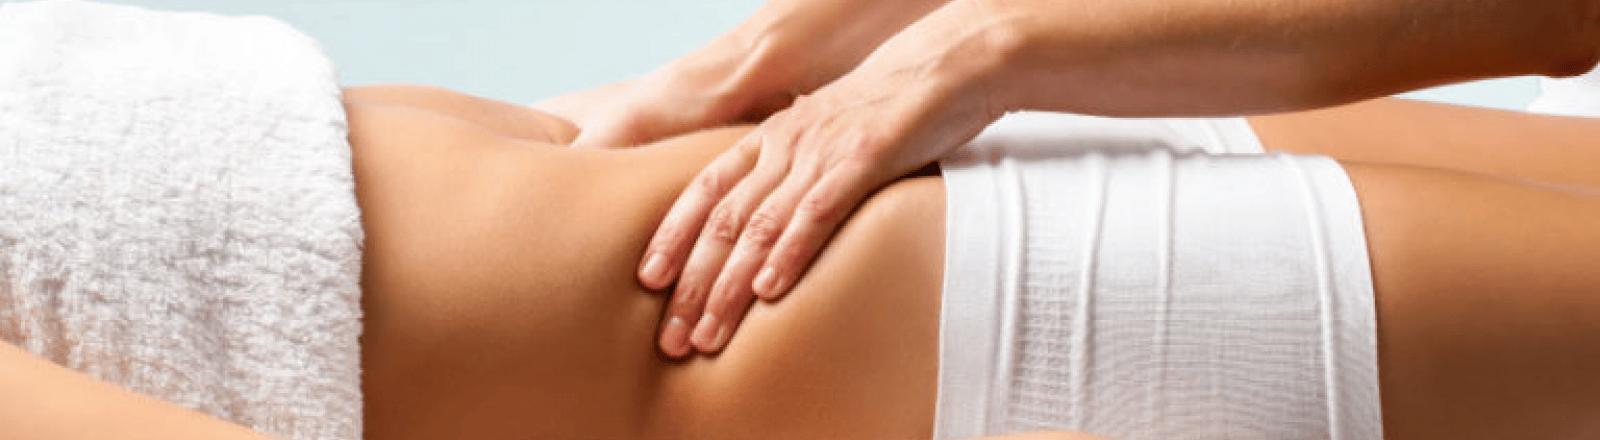 Fisioterapia suelo pélvico - mujer